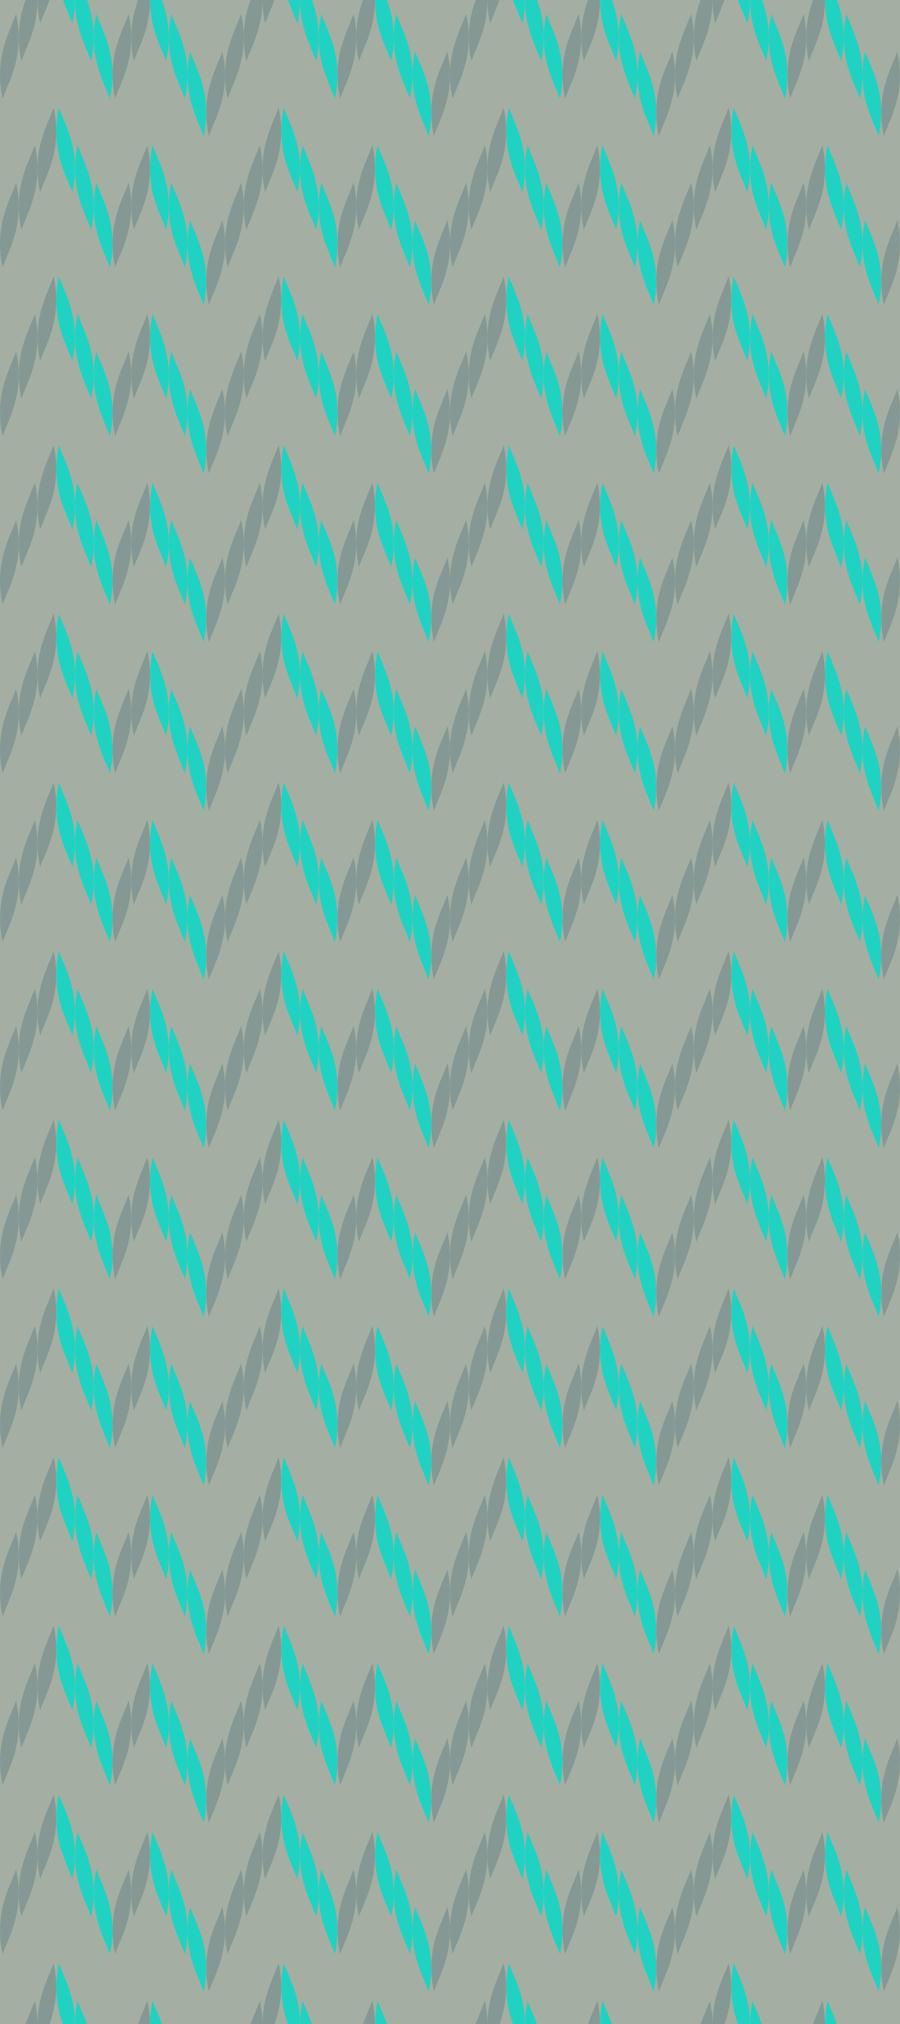 Gray And White Chevron Wallpaper Knit zig zag   gray 900x2024